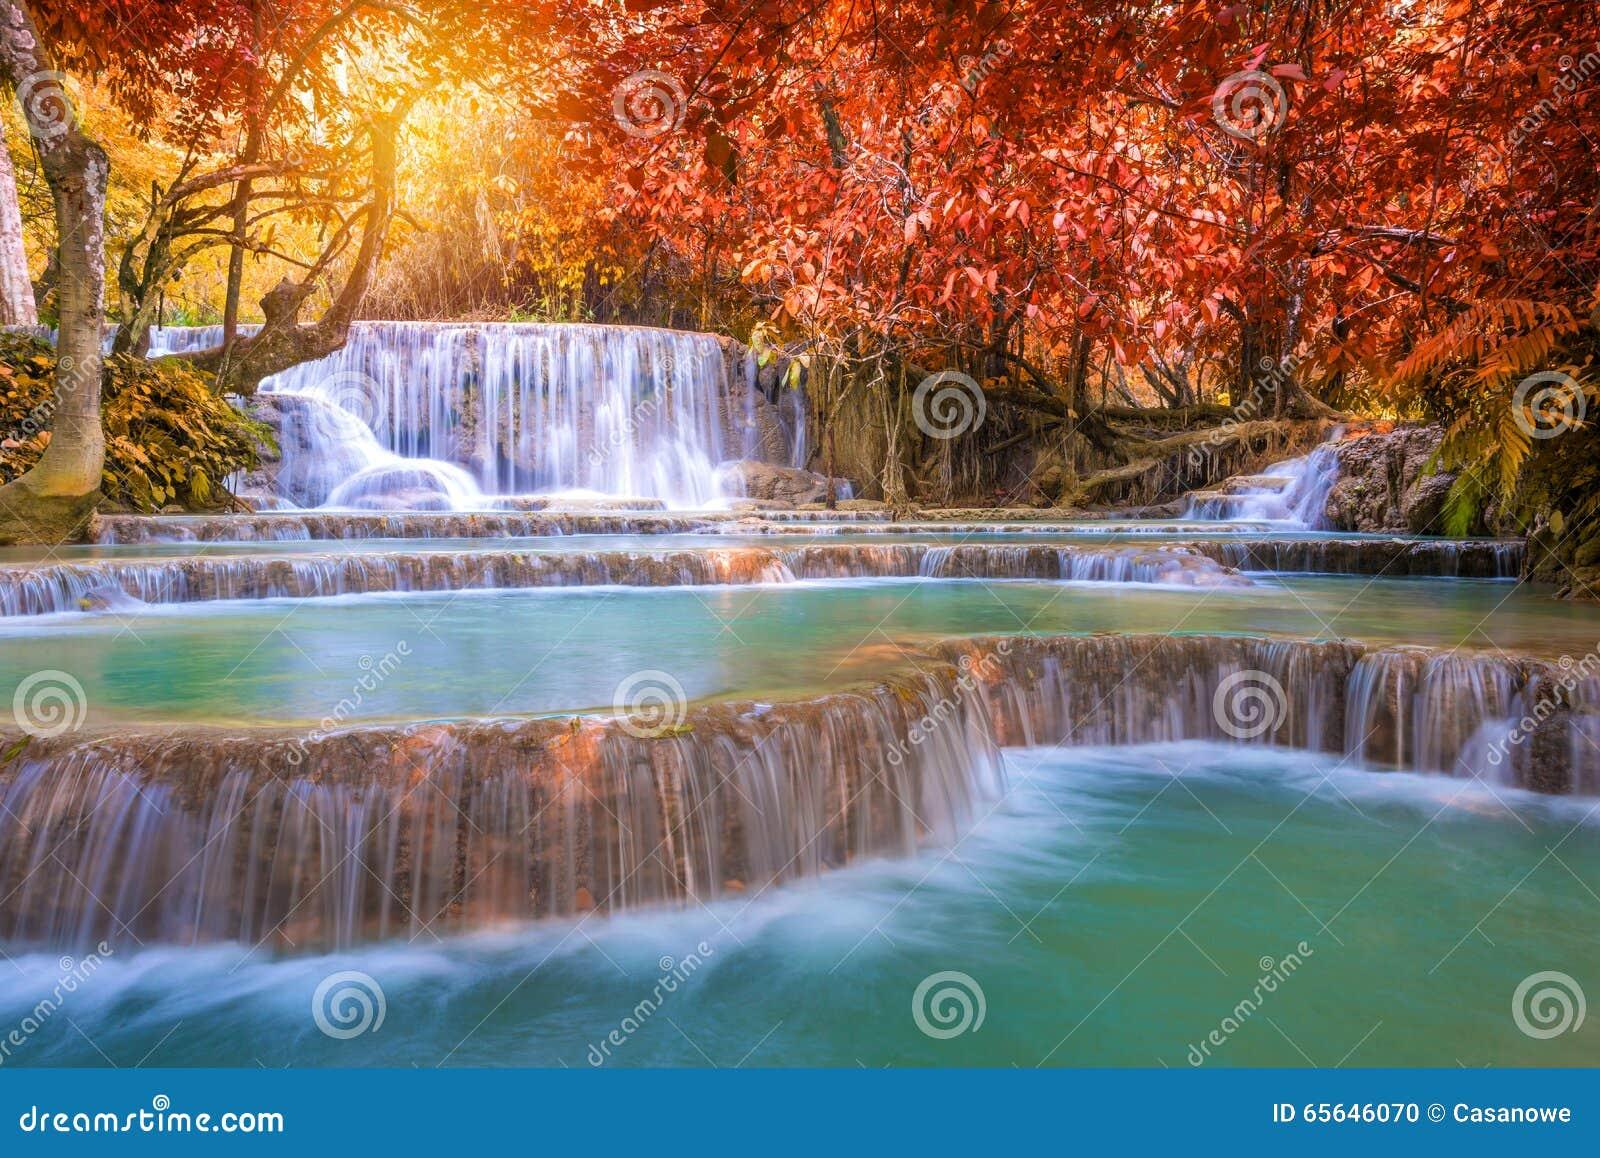 Cascade dans la forêt tropicale (Tat Kuang Si Waterfalls au praba de Luang